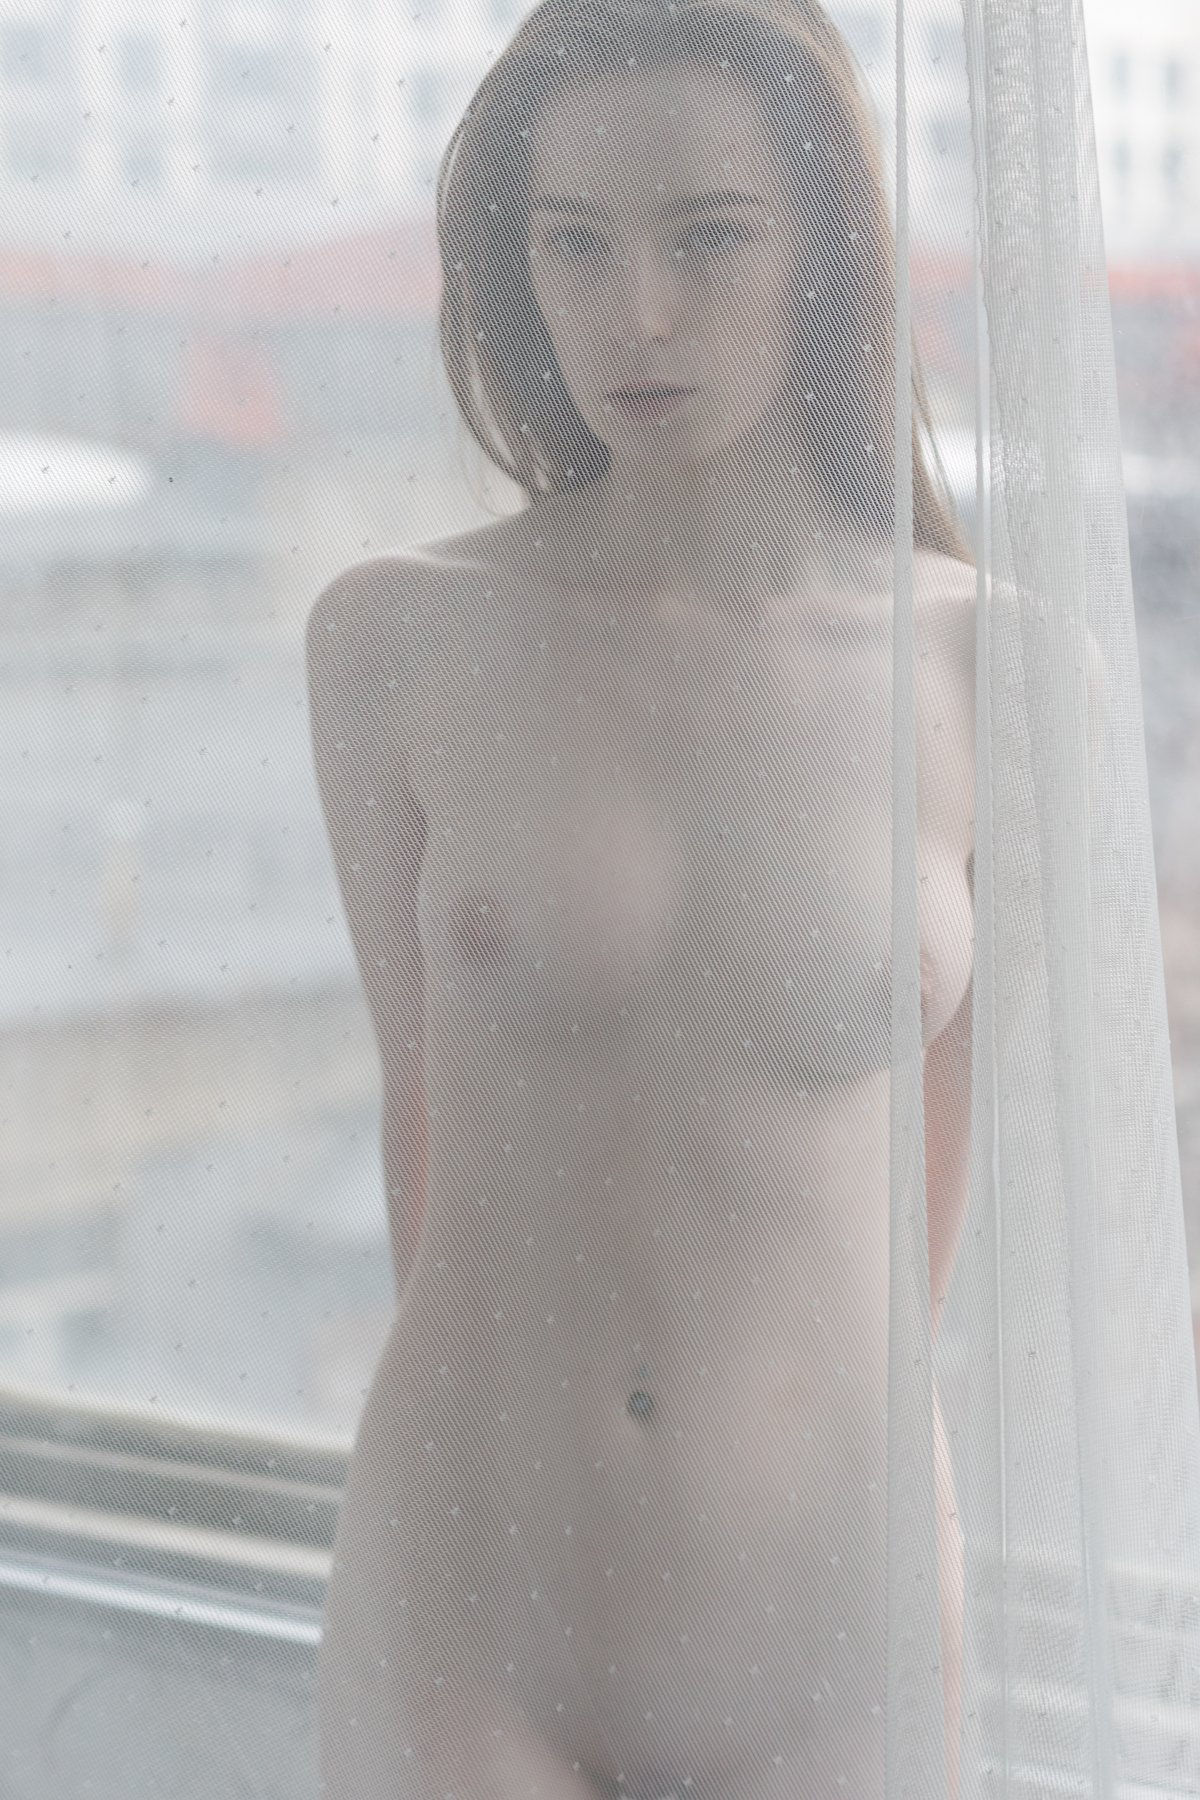 sexy, girl, female, body, beauty, beautiful, sensual, skin, young, nude, attractive, model, naked, posing, woman, studio, fashion, erotic, person, caucasian, sensuality, lady, pose, pretty, figure, slim, portrait, women, adult, legs, Smirnoff Igor